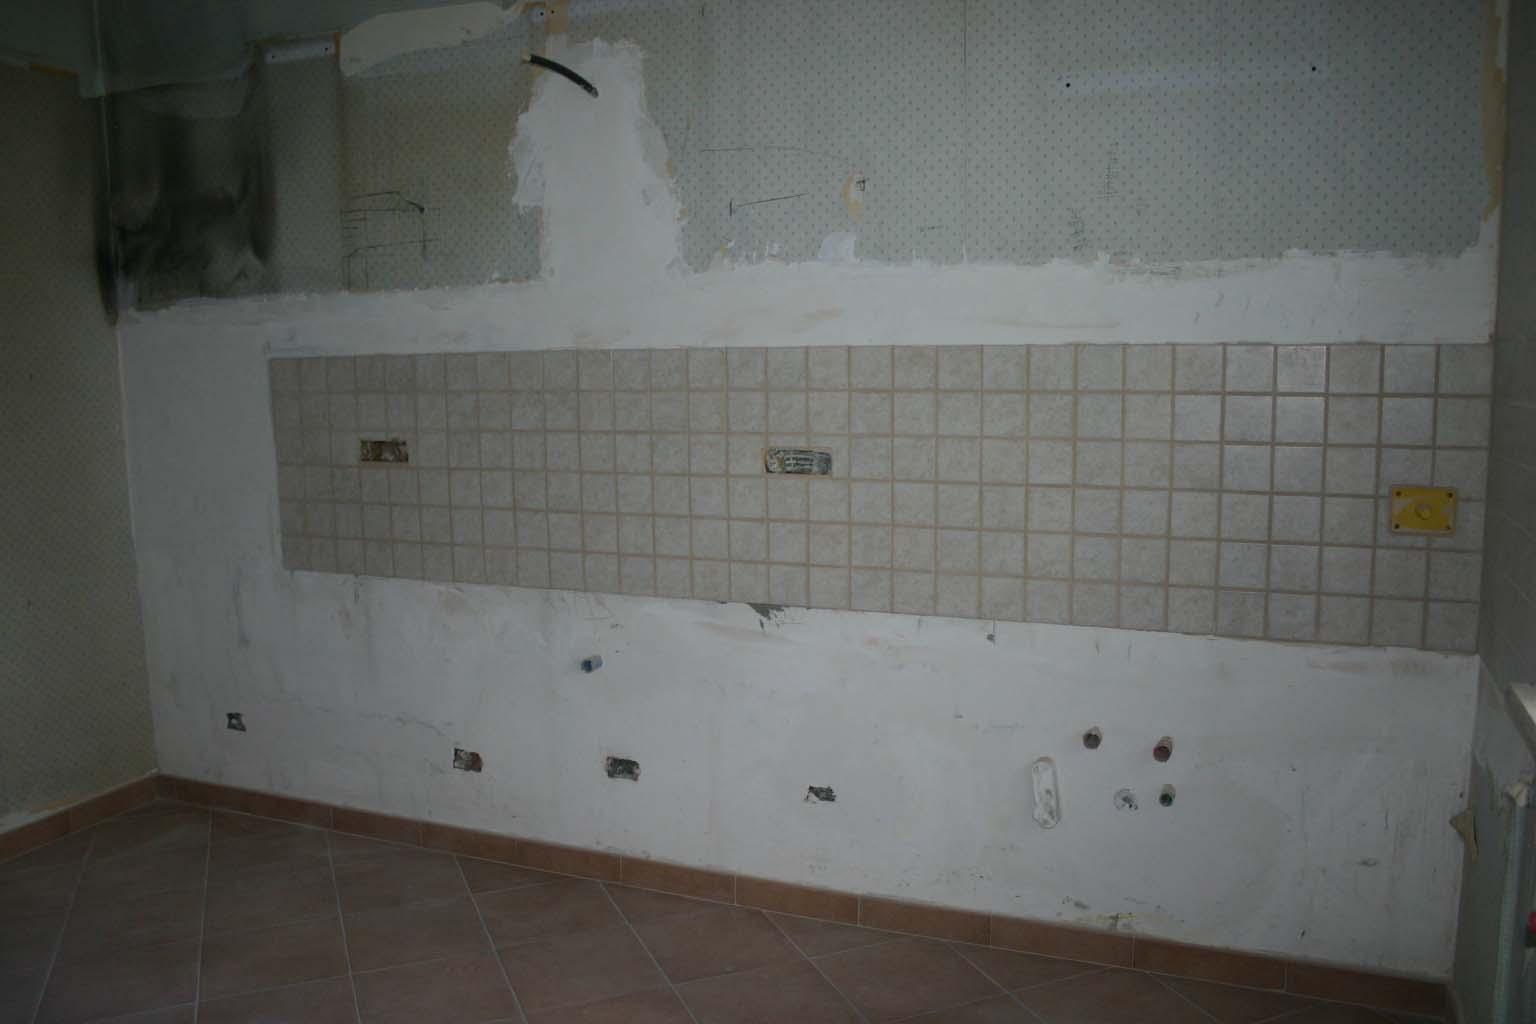 Ristrutturazione bagno e cucina sig garbero 2009 011 - Ristrutturazione bagno e cucina ...